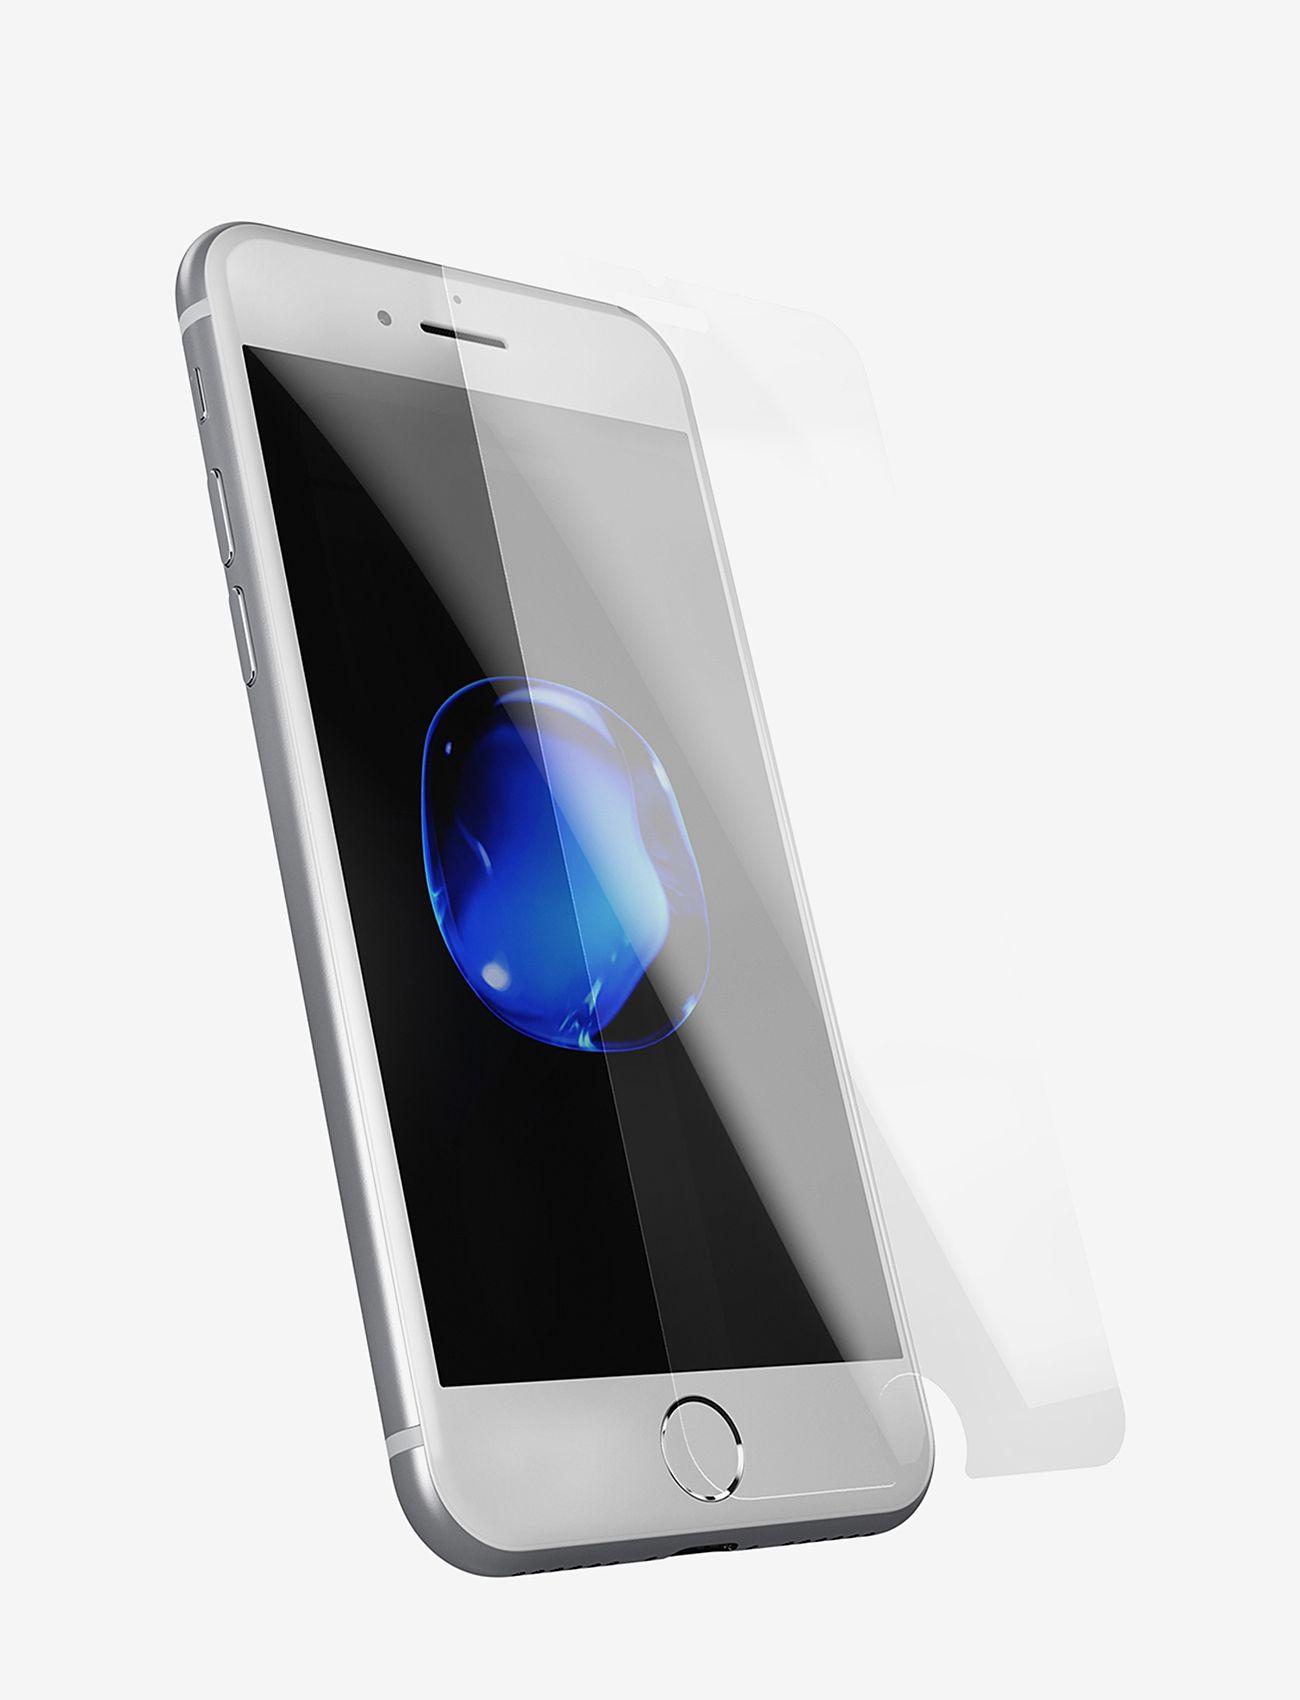 Holdit - Temp glass iPhone 6/6s/7/8Plus - suojakalvot - 2.5d transparent - 0